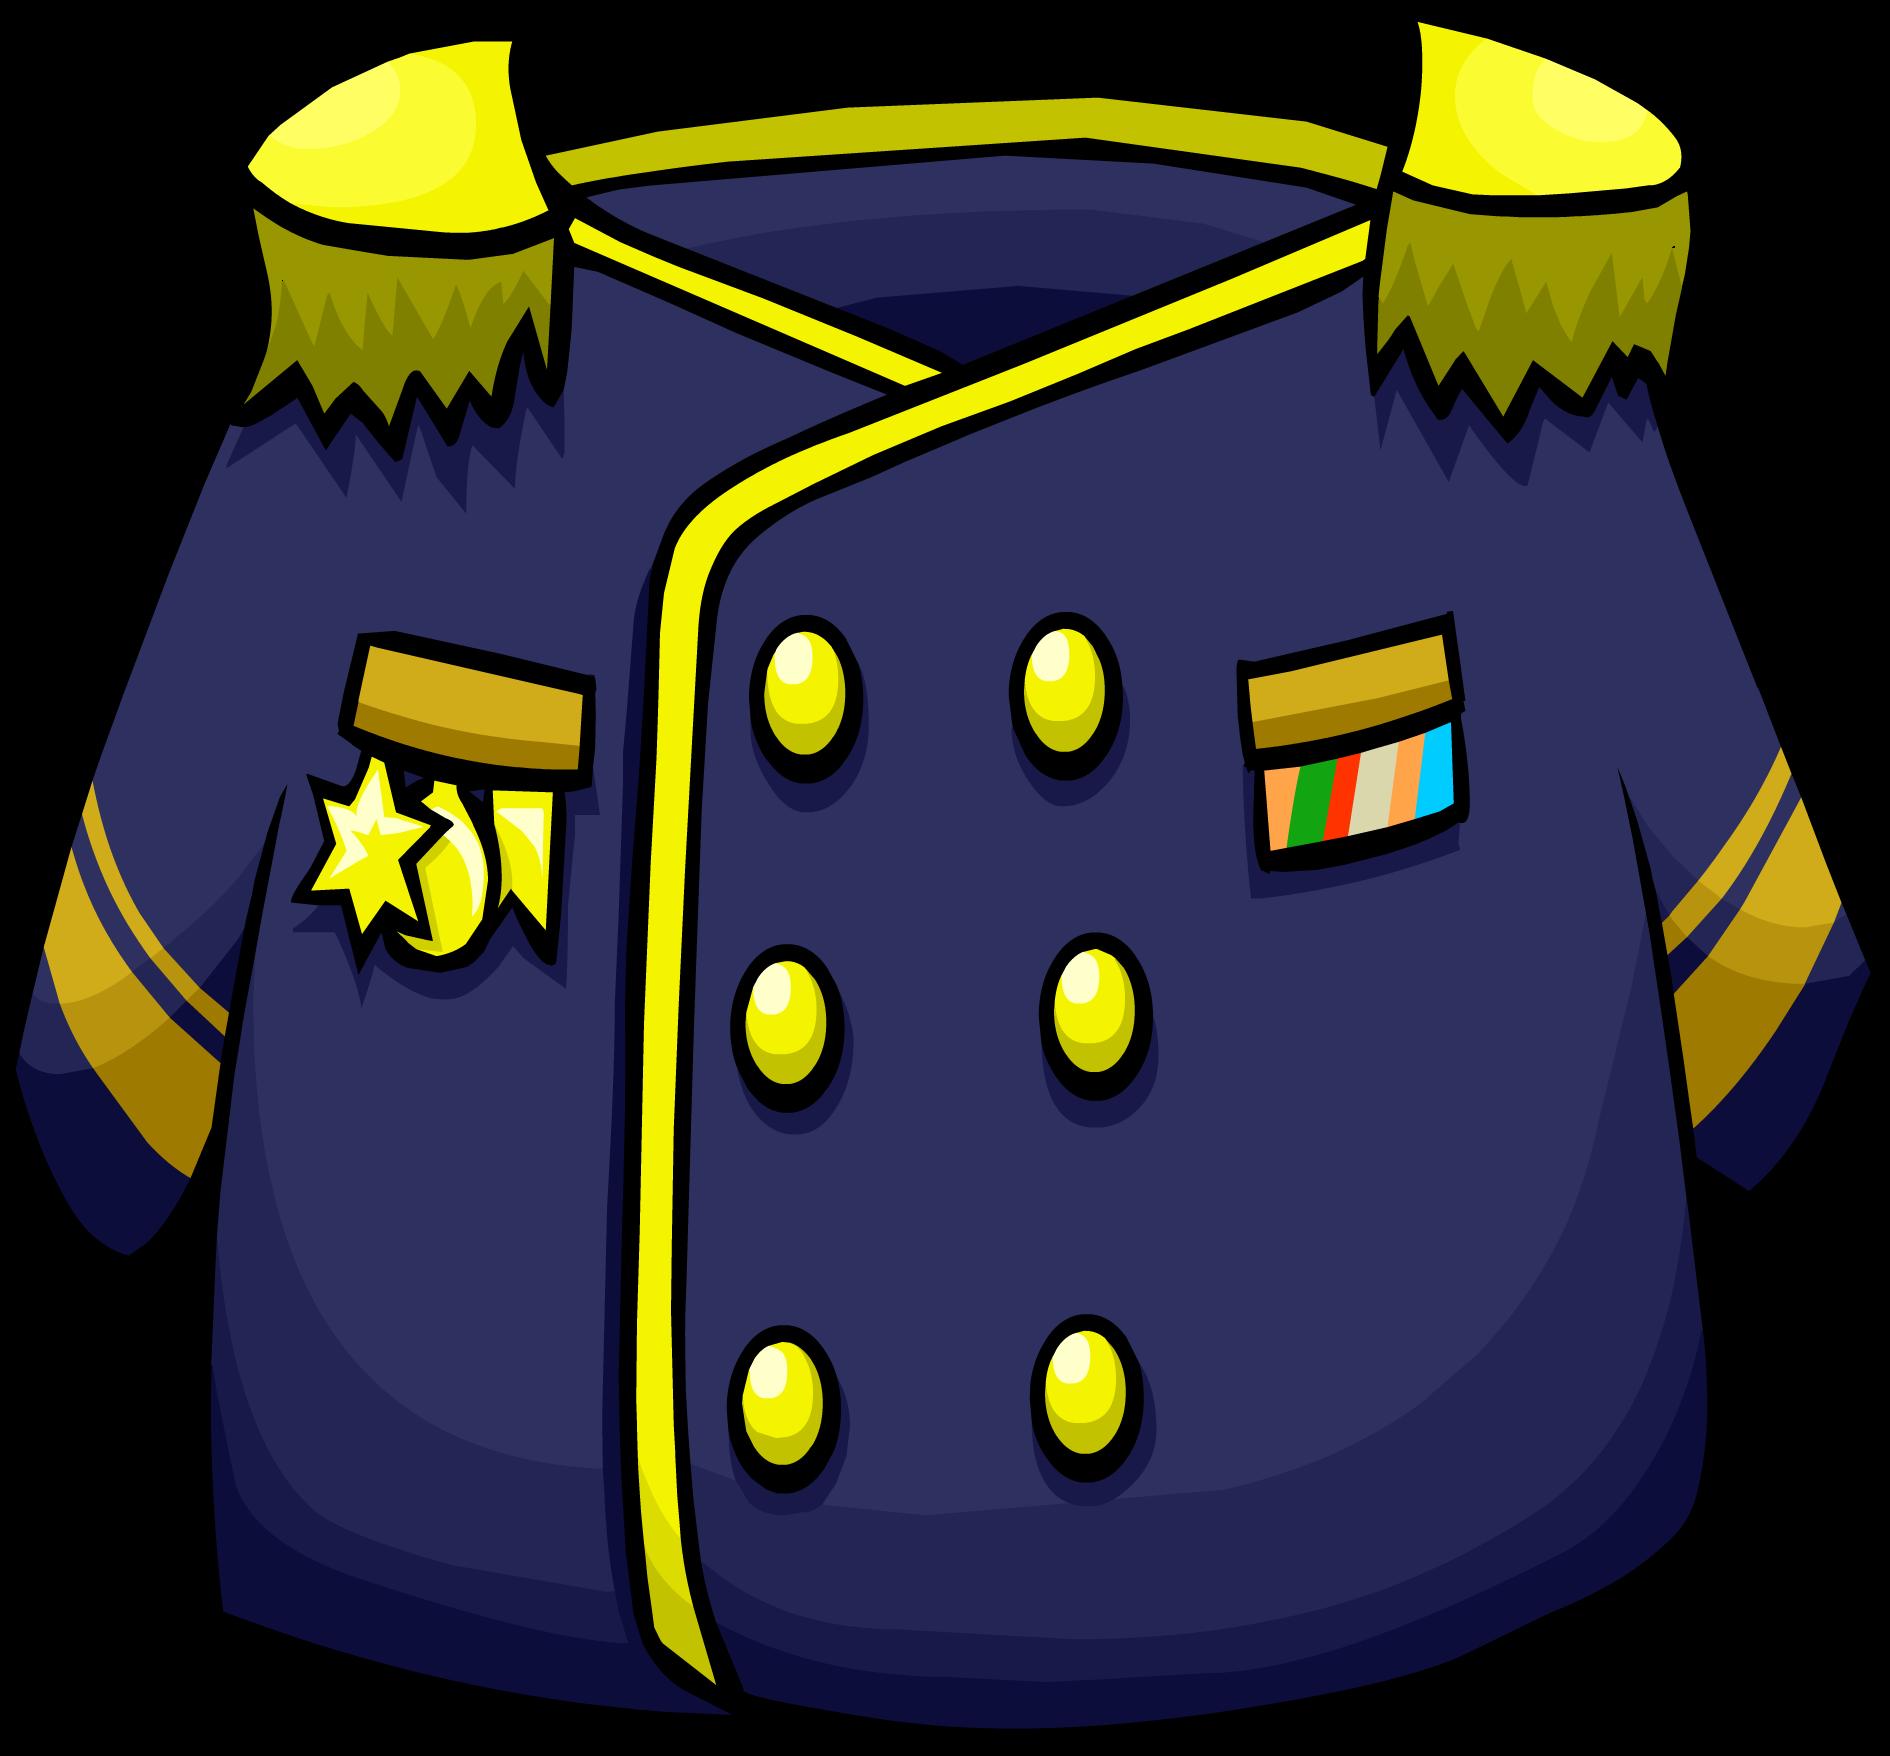 Admirals club penguin rewritten. Jacket clipart purple jacket